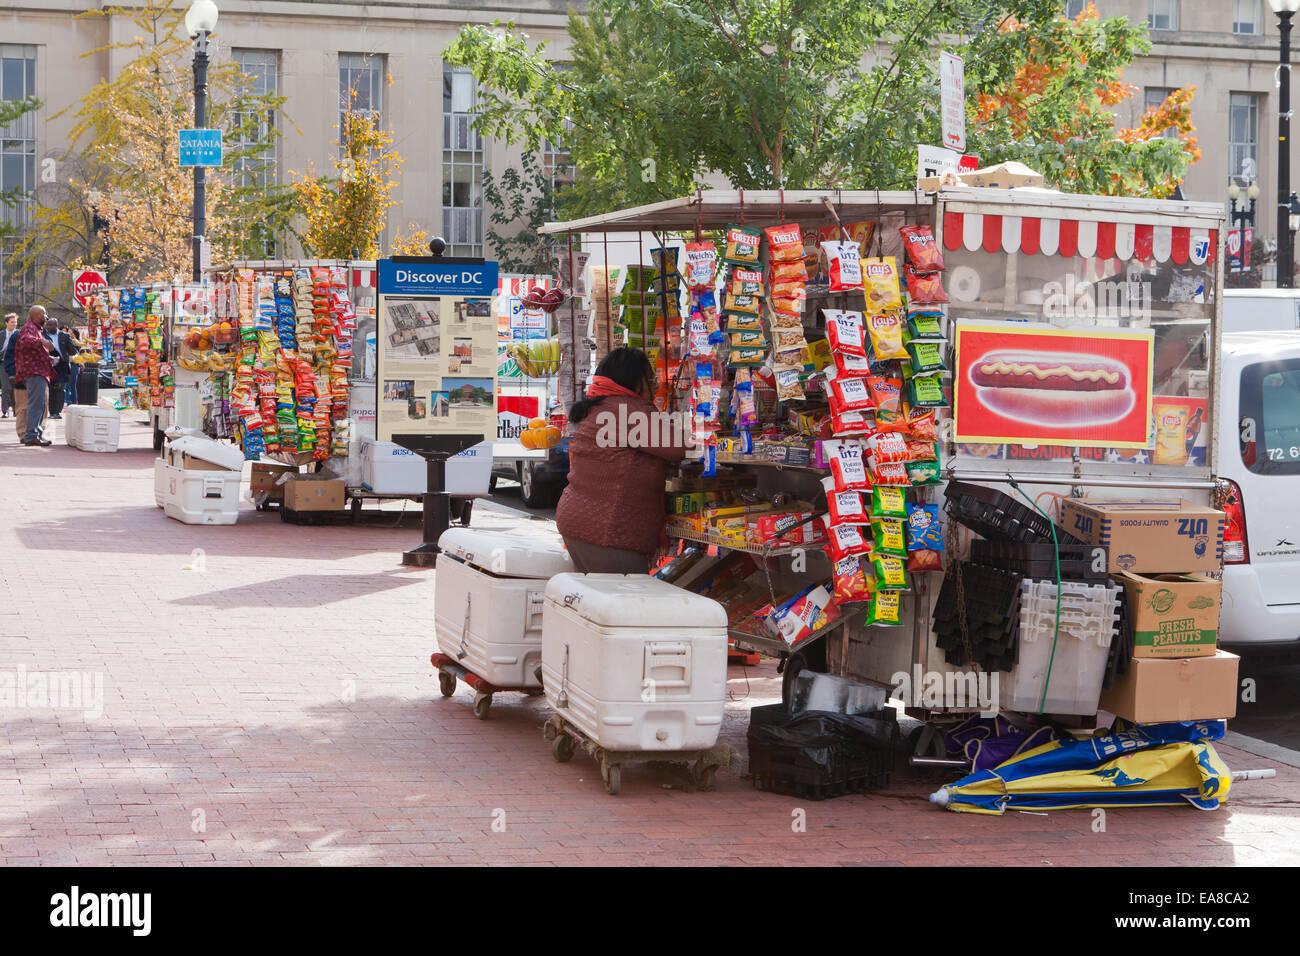 Hot dog vendor carts - Washington, DC USA - Stock Image